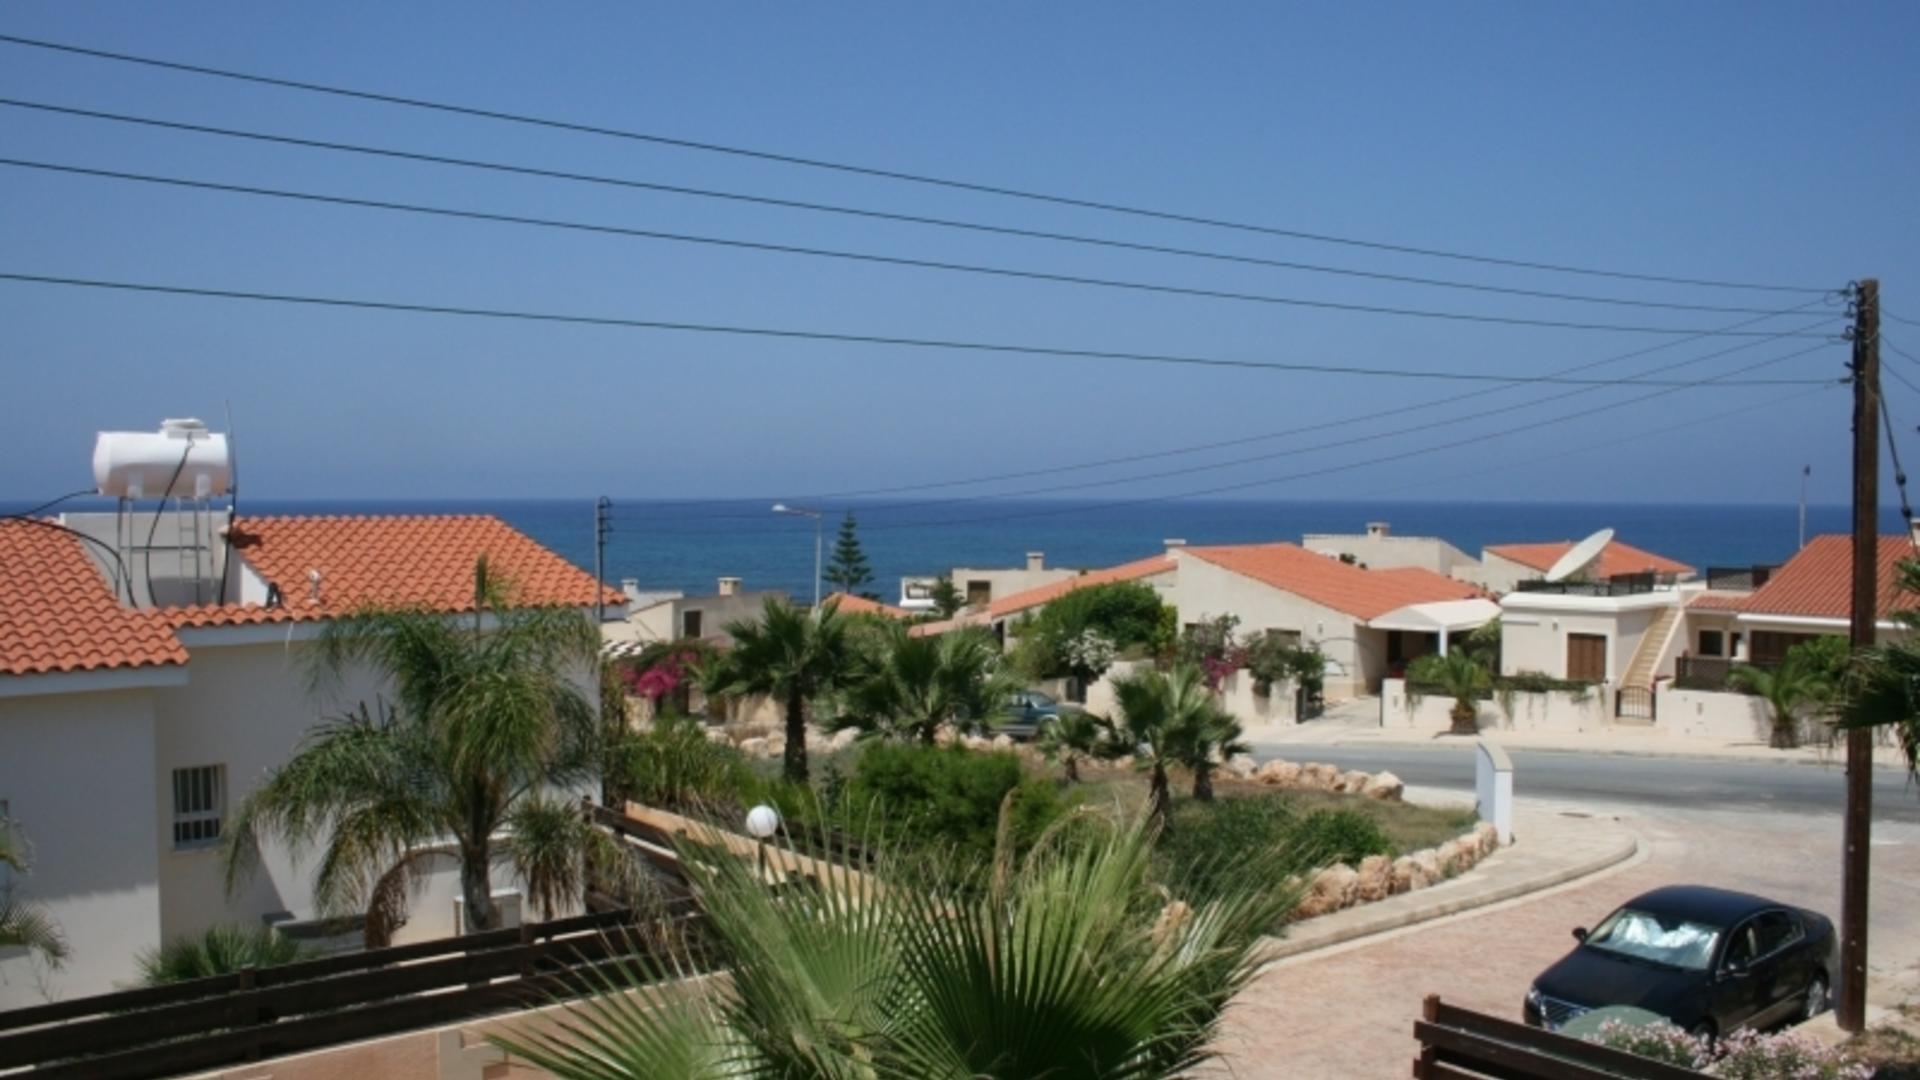 3 Bedroom Private villa in  Cyprus